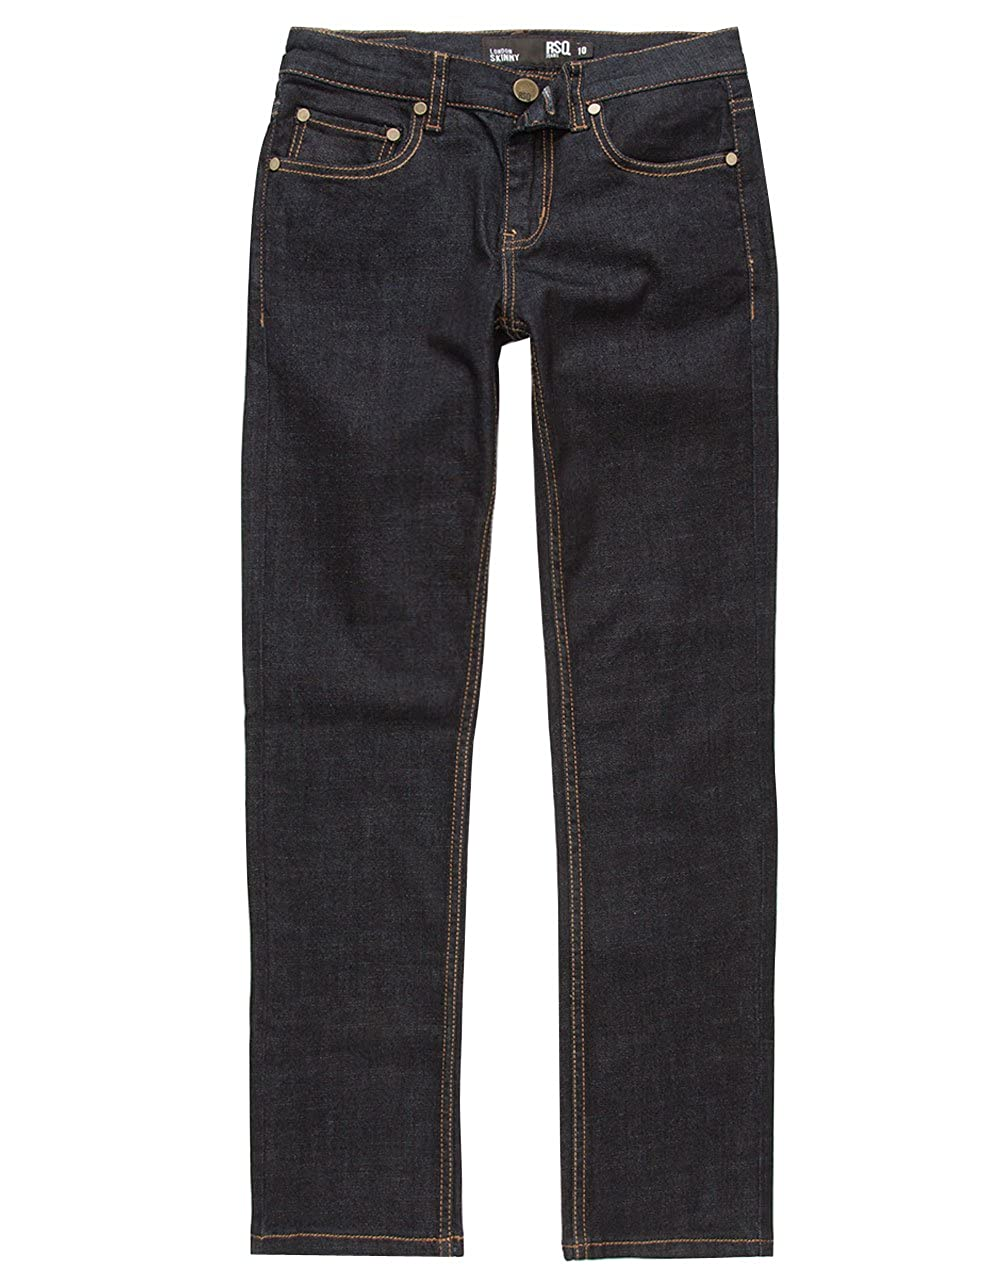 Rsq London Boys Skinny Stretch Jeans 280332